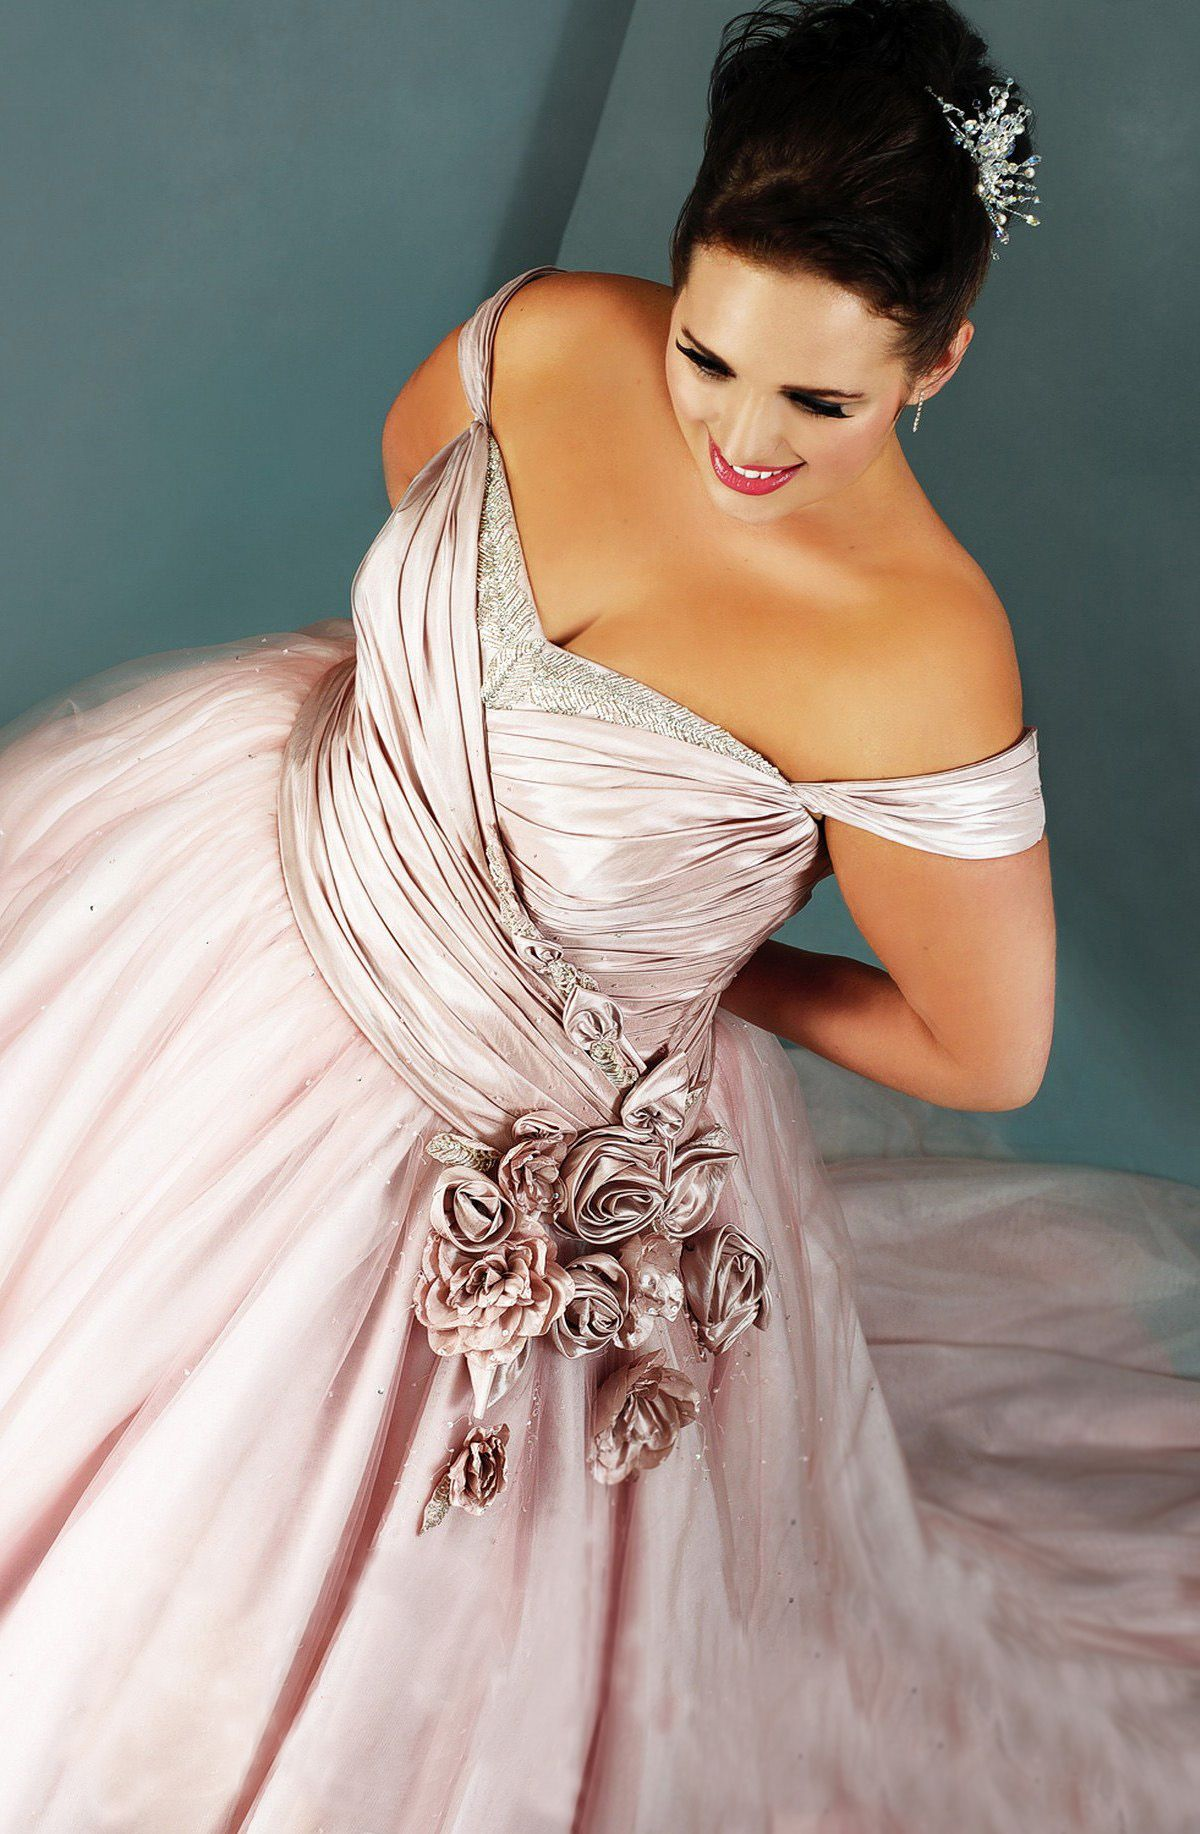 Plus size pink wedding dresses   Plus Size wedding dresses Plus Size wedding dresses